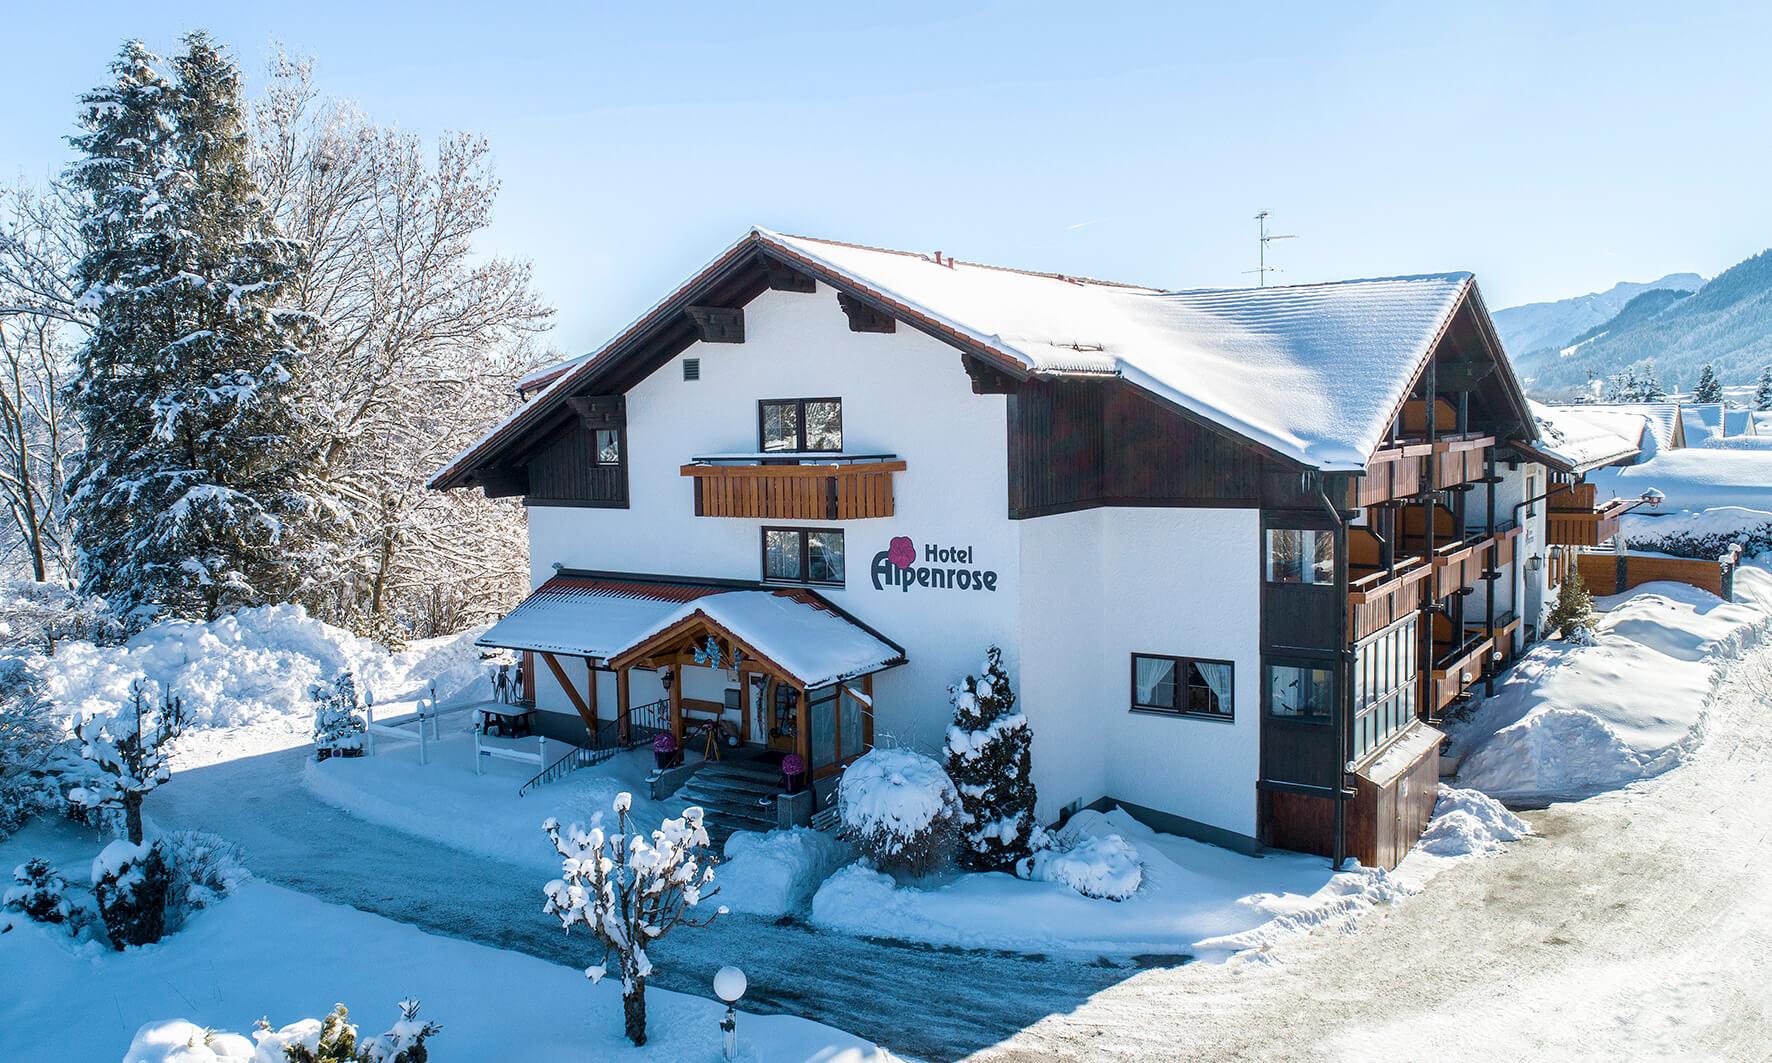 Hotel Alpenrose, Nesselwang